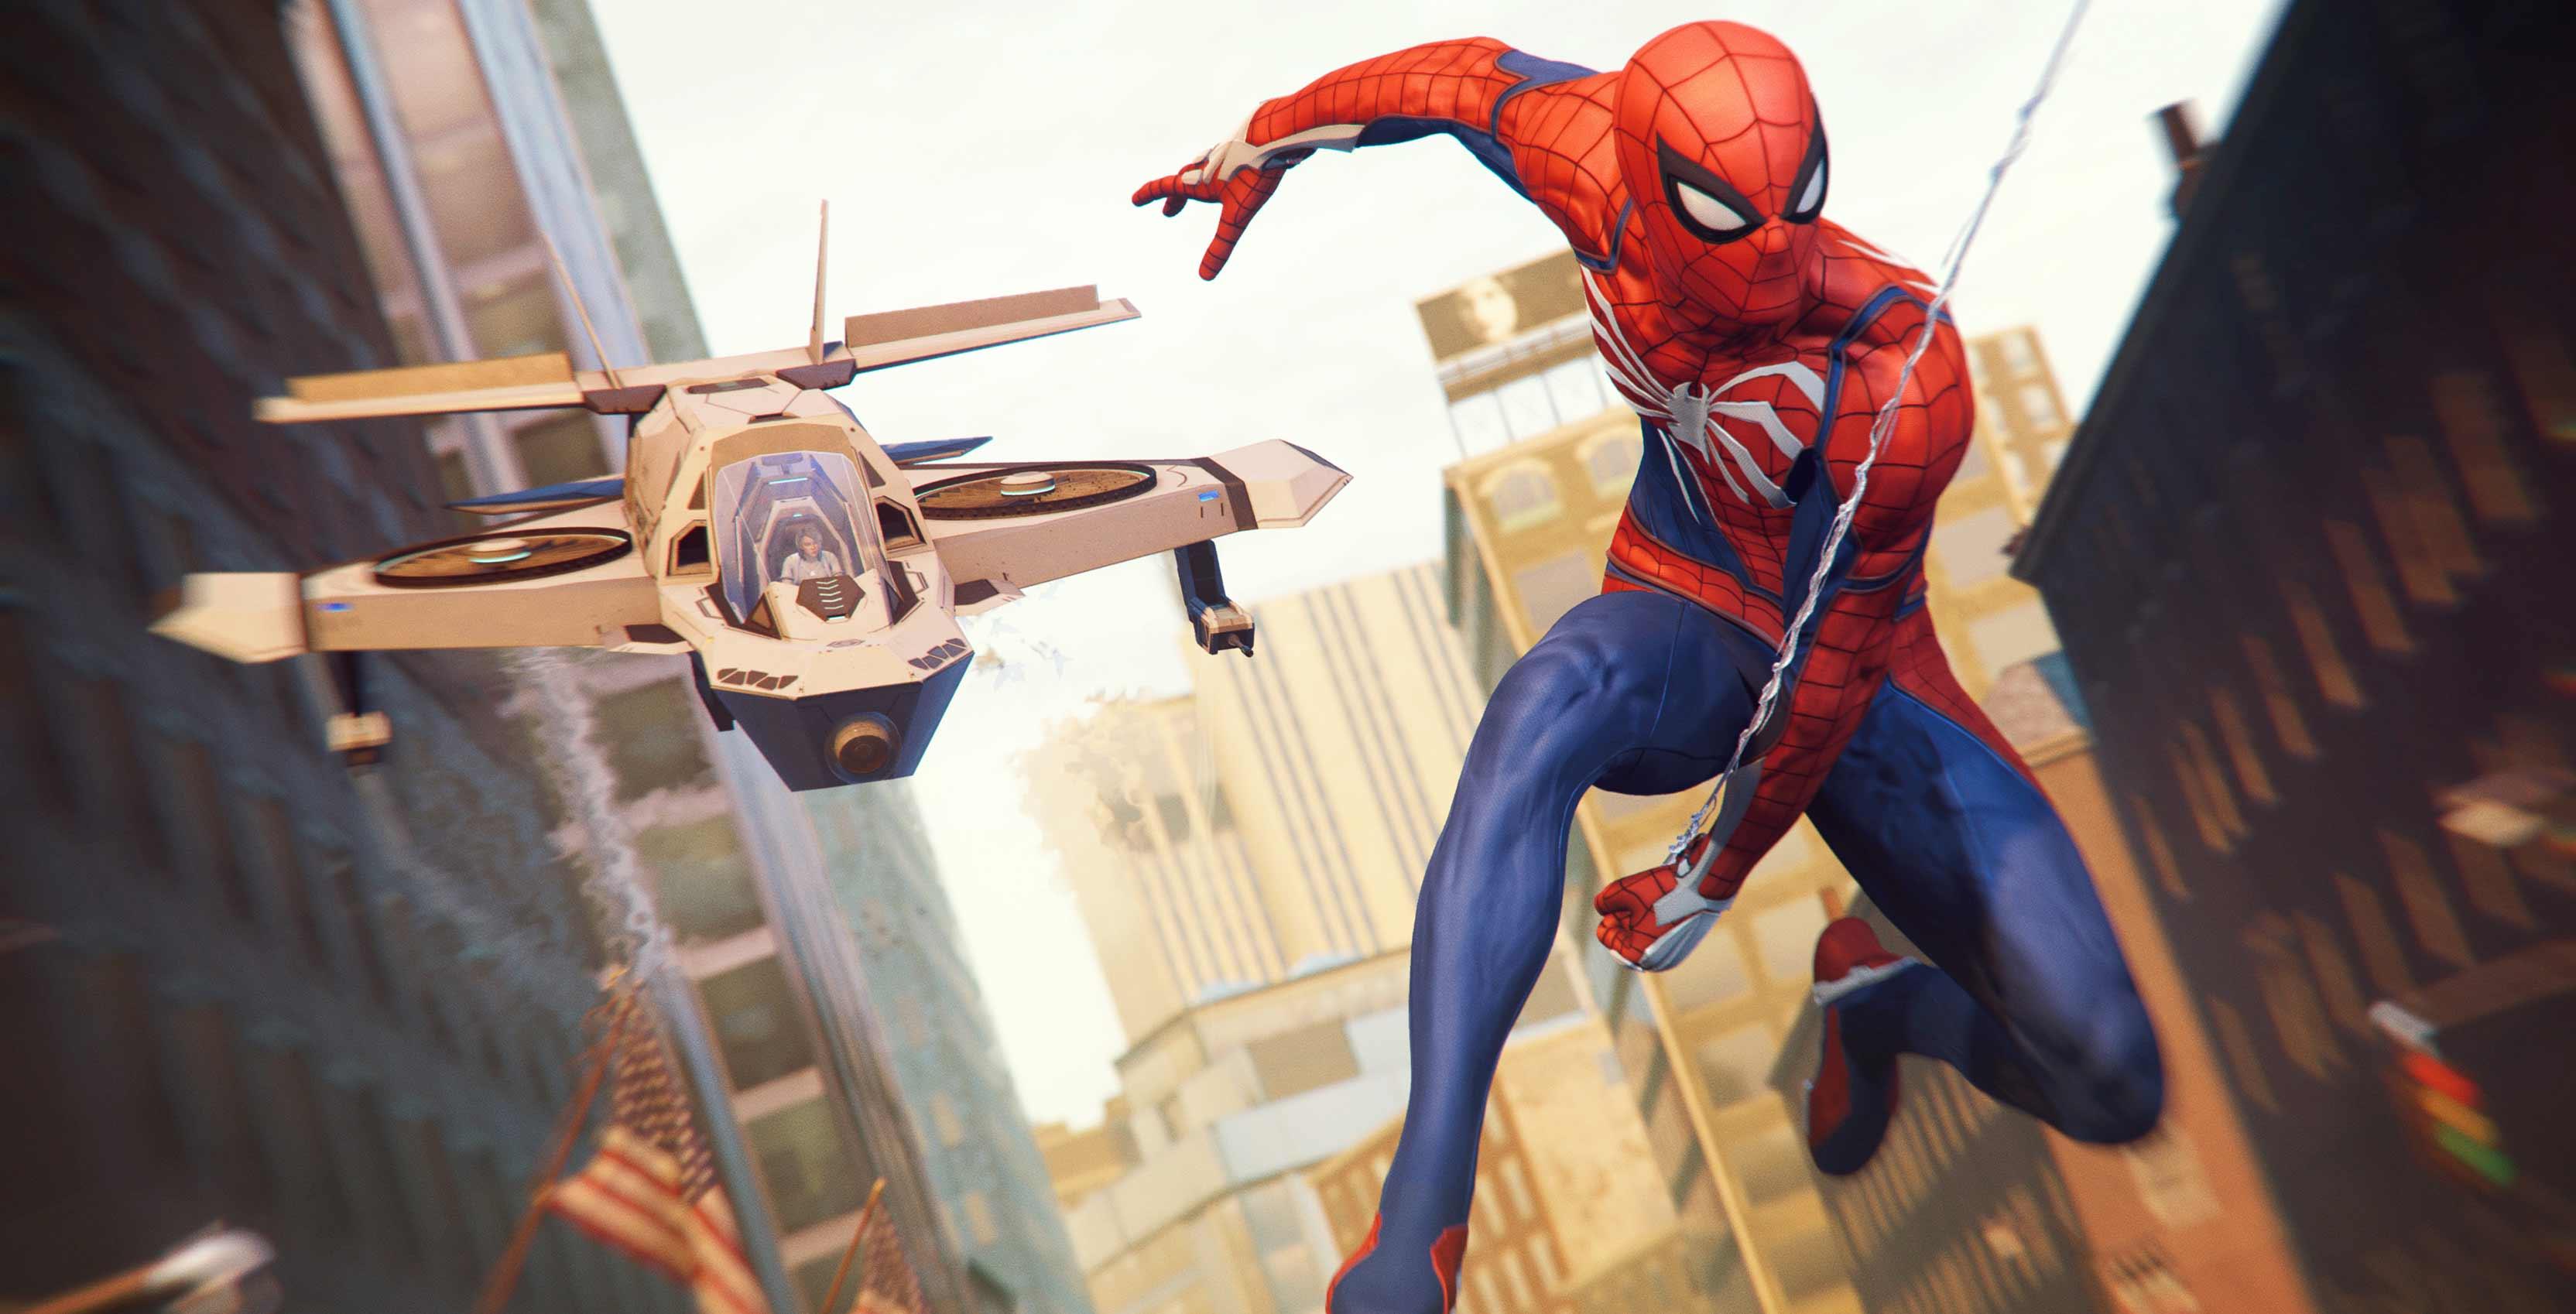 Spider-Man Silver Lining ship